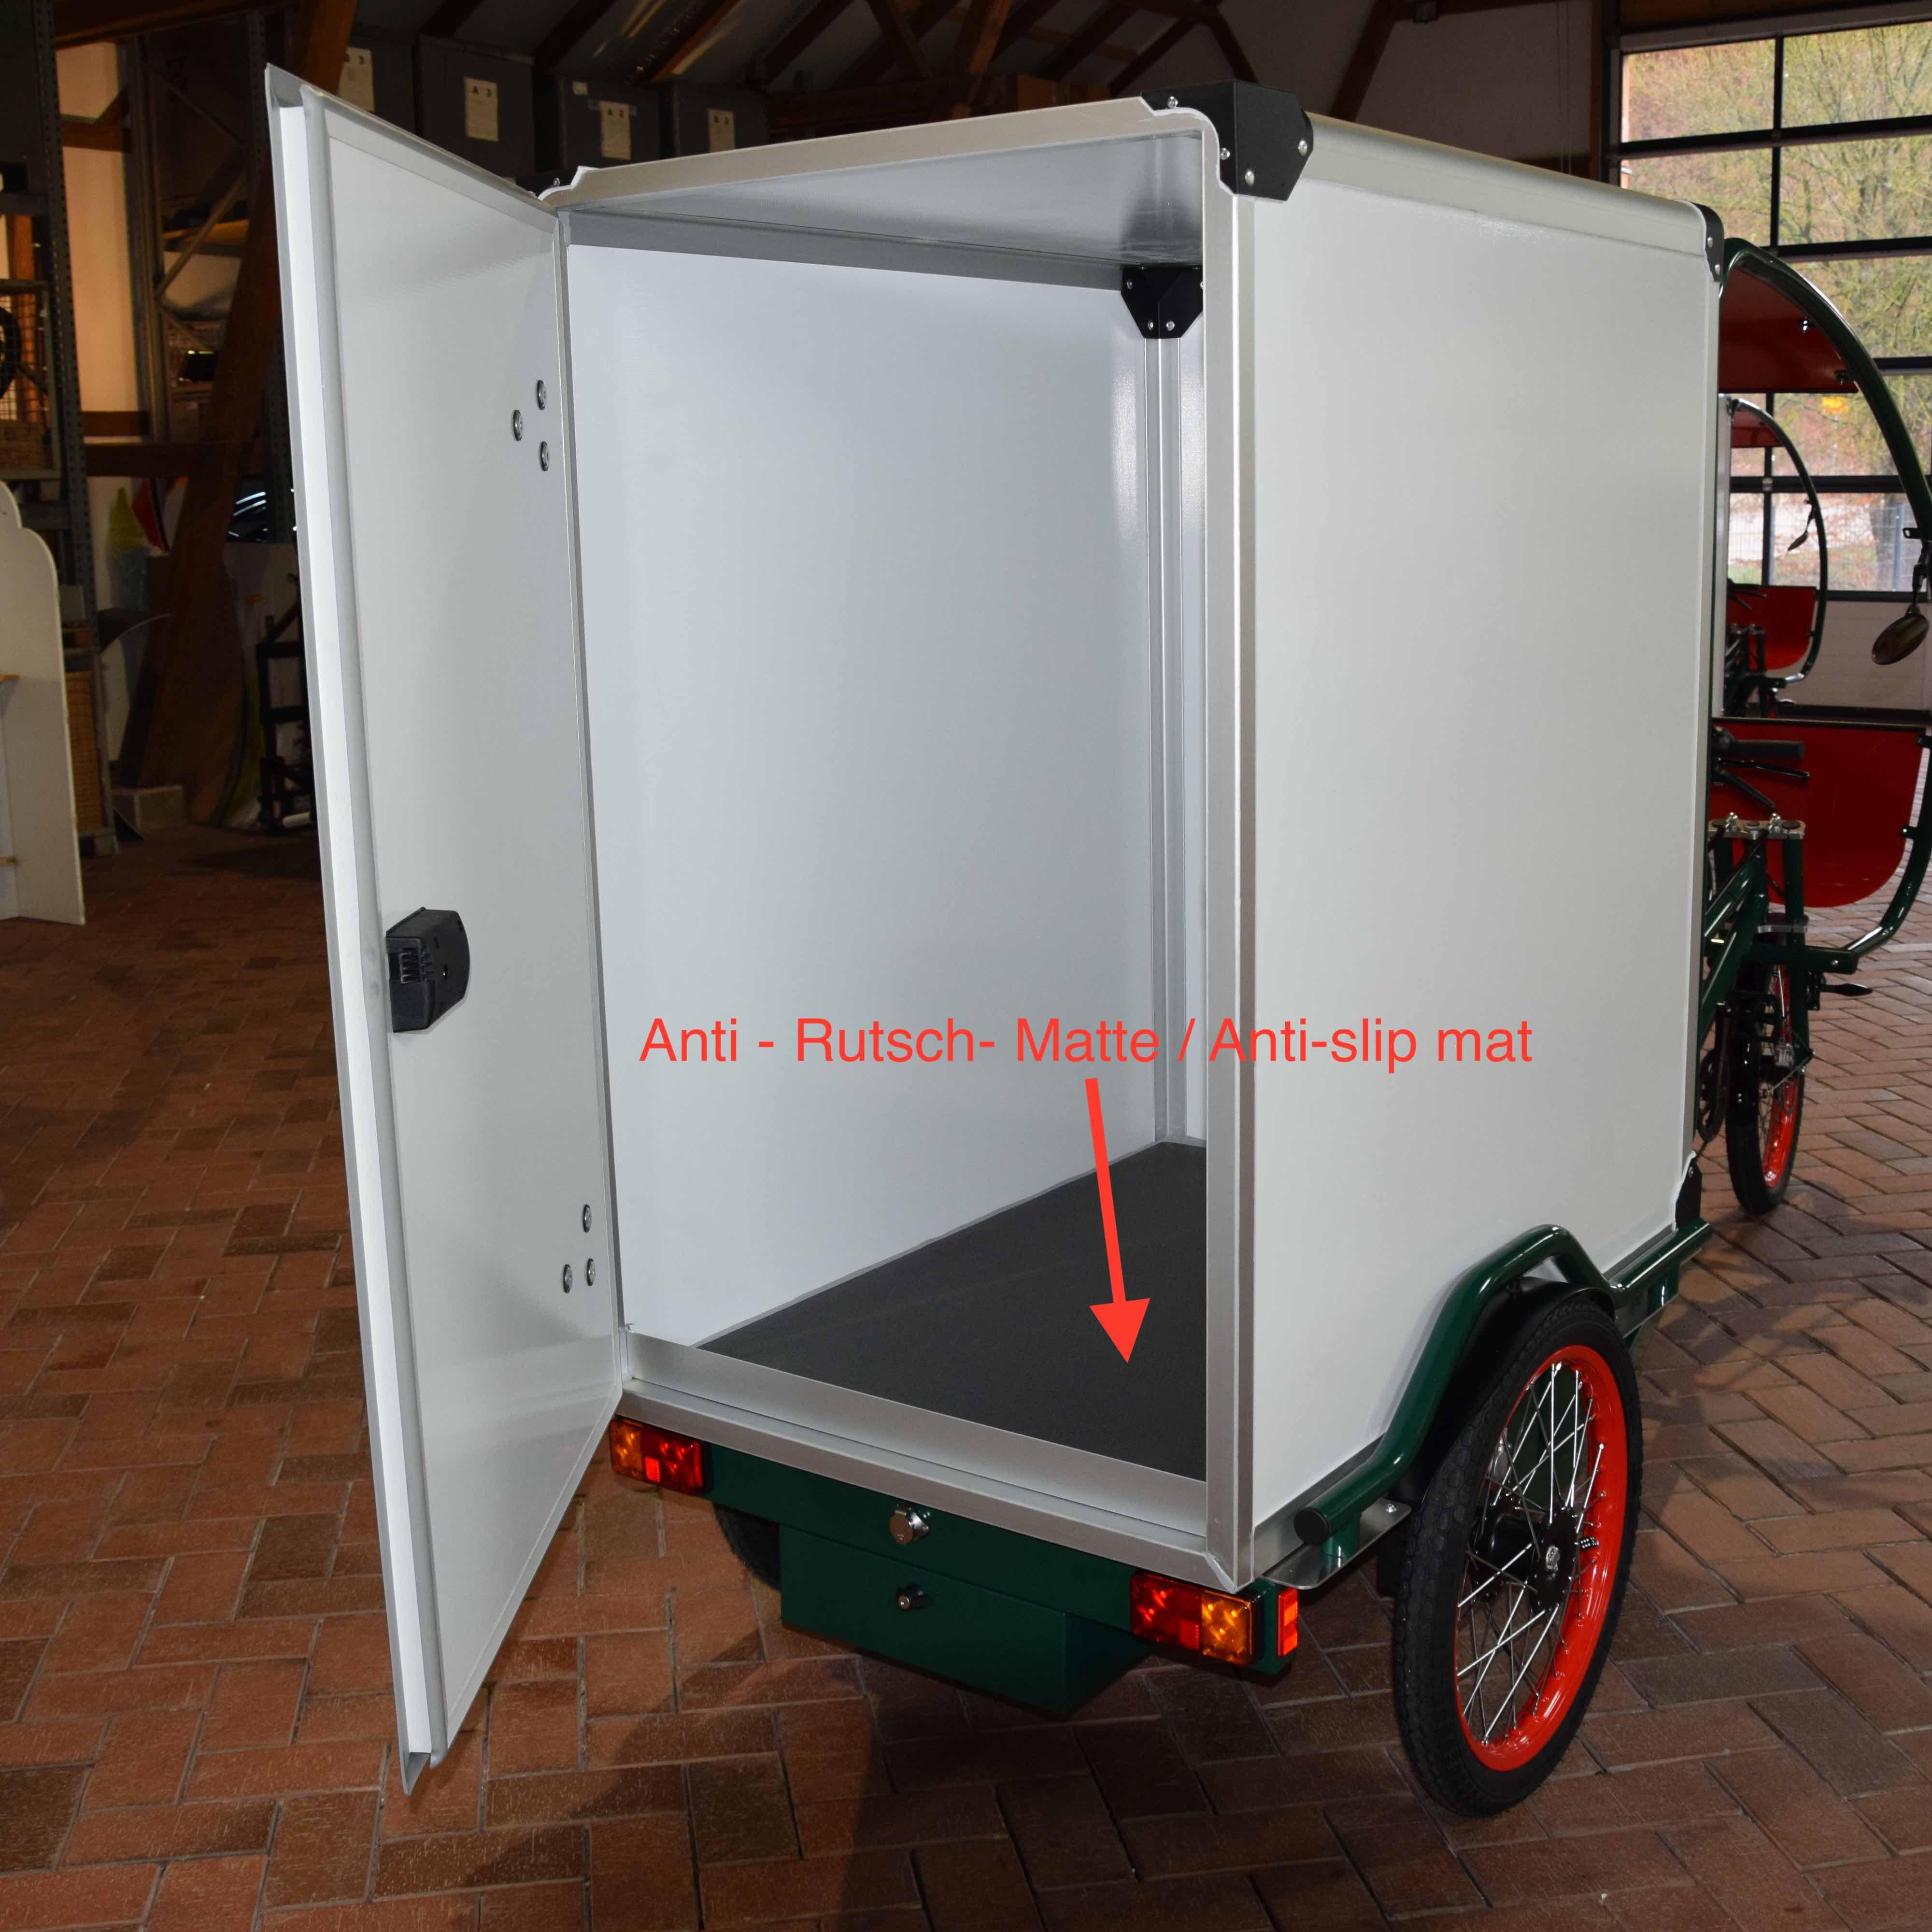 Anti- Rutsch- Matte CARGOBOX Container Humbaur